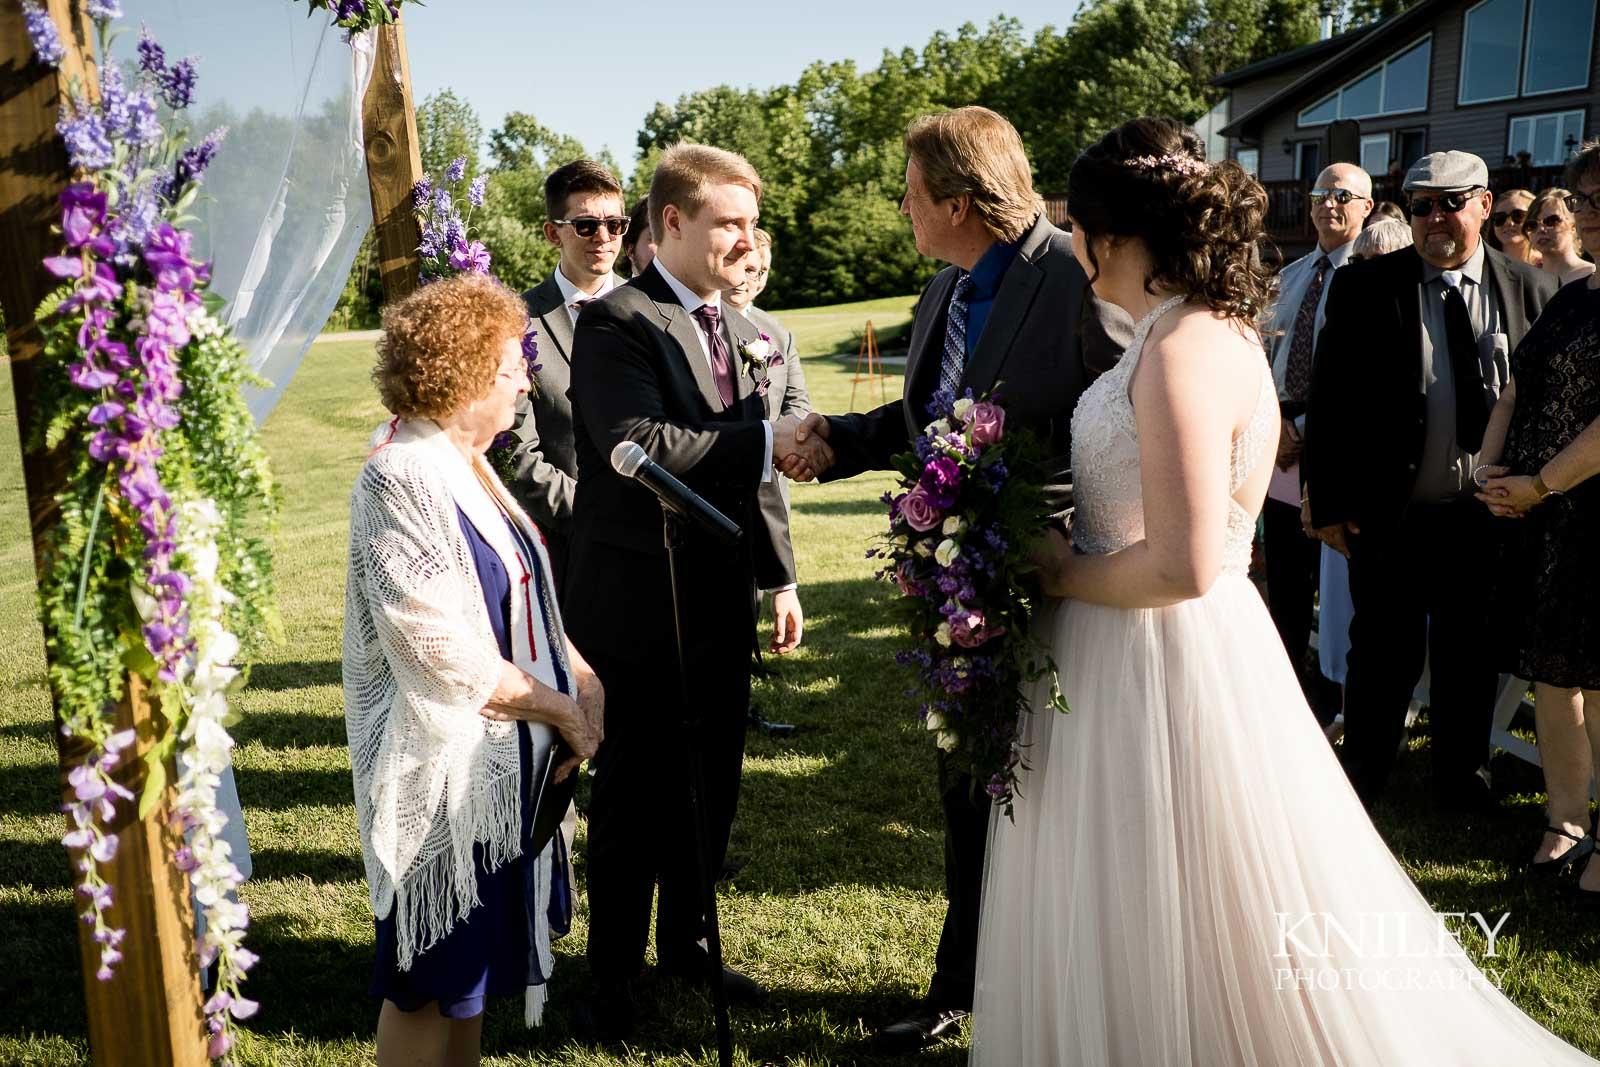 26-Redmond-House-Dansville-NY-Wedding-Photography.jpg